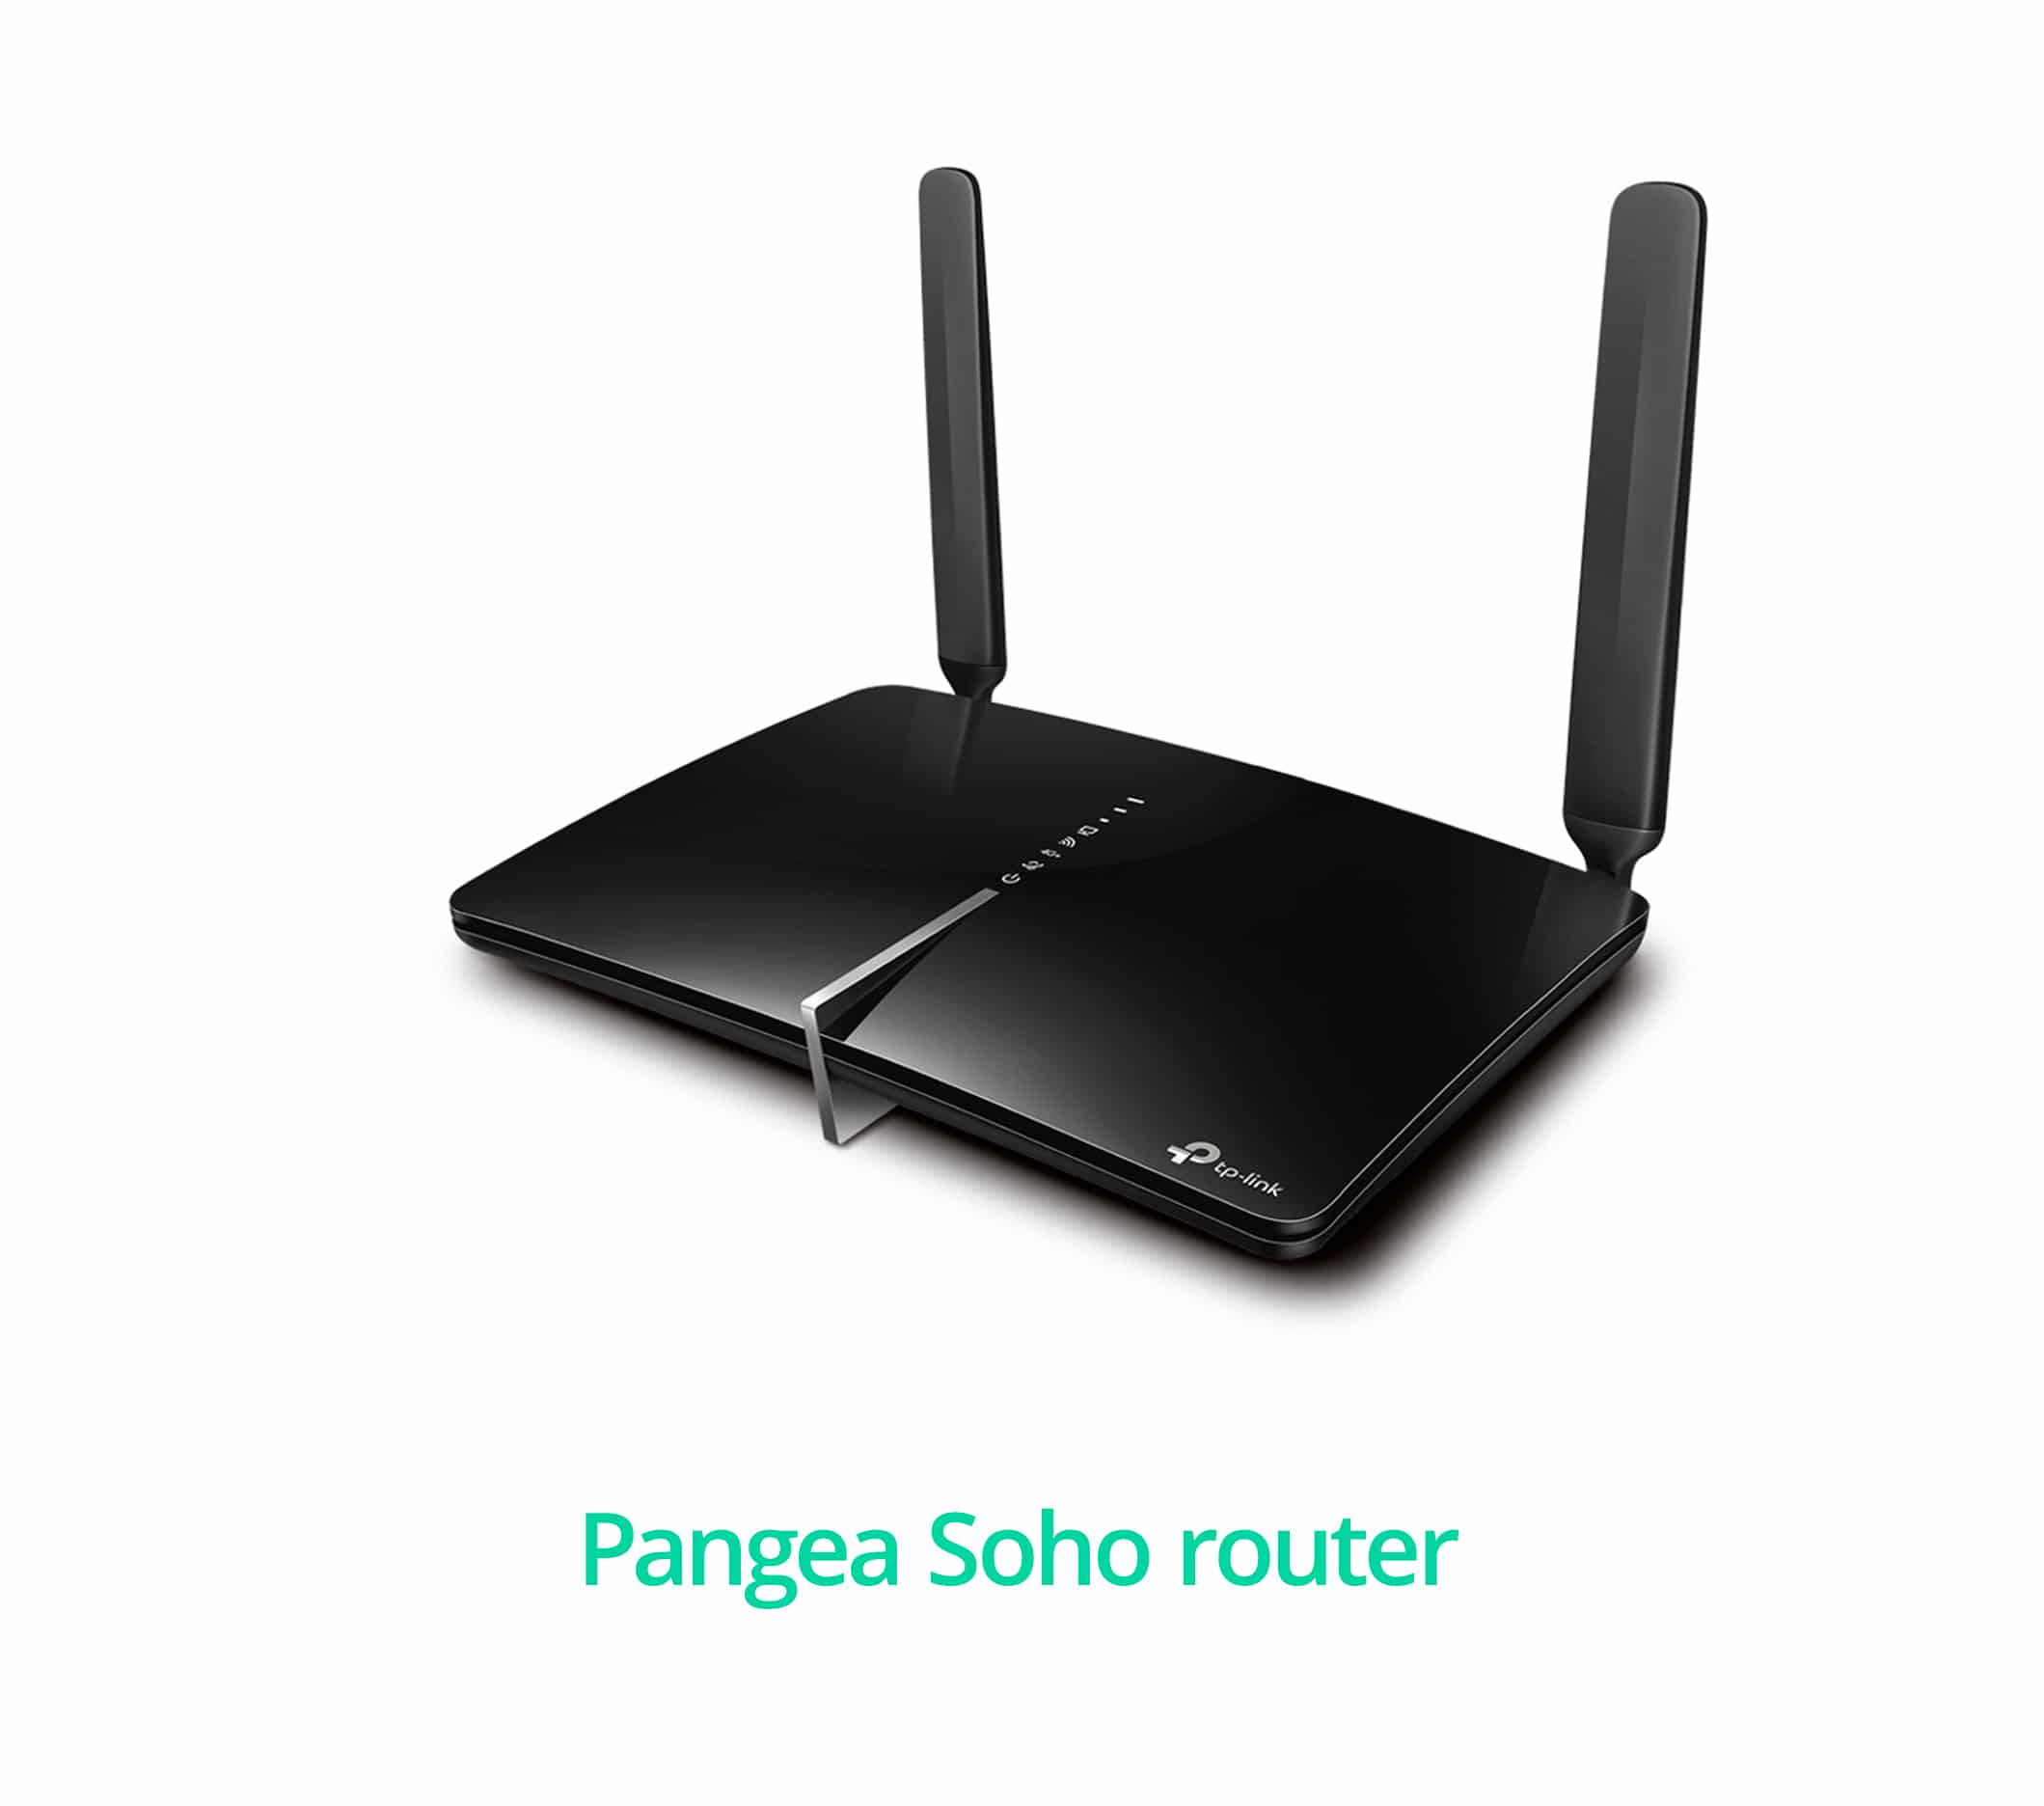 Pangea Enterprise router - Pangea Soho router link